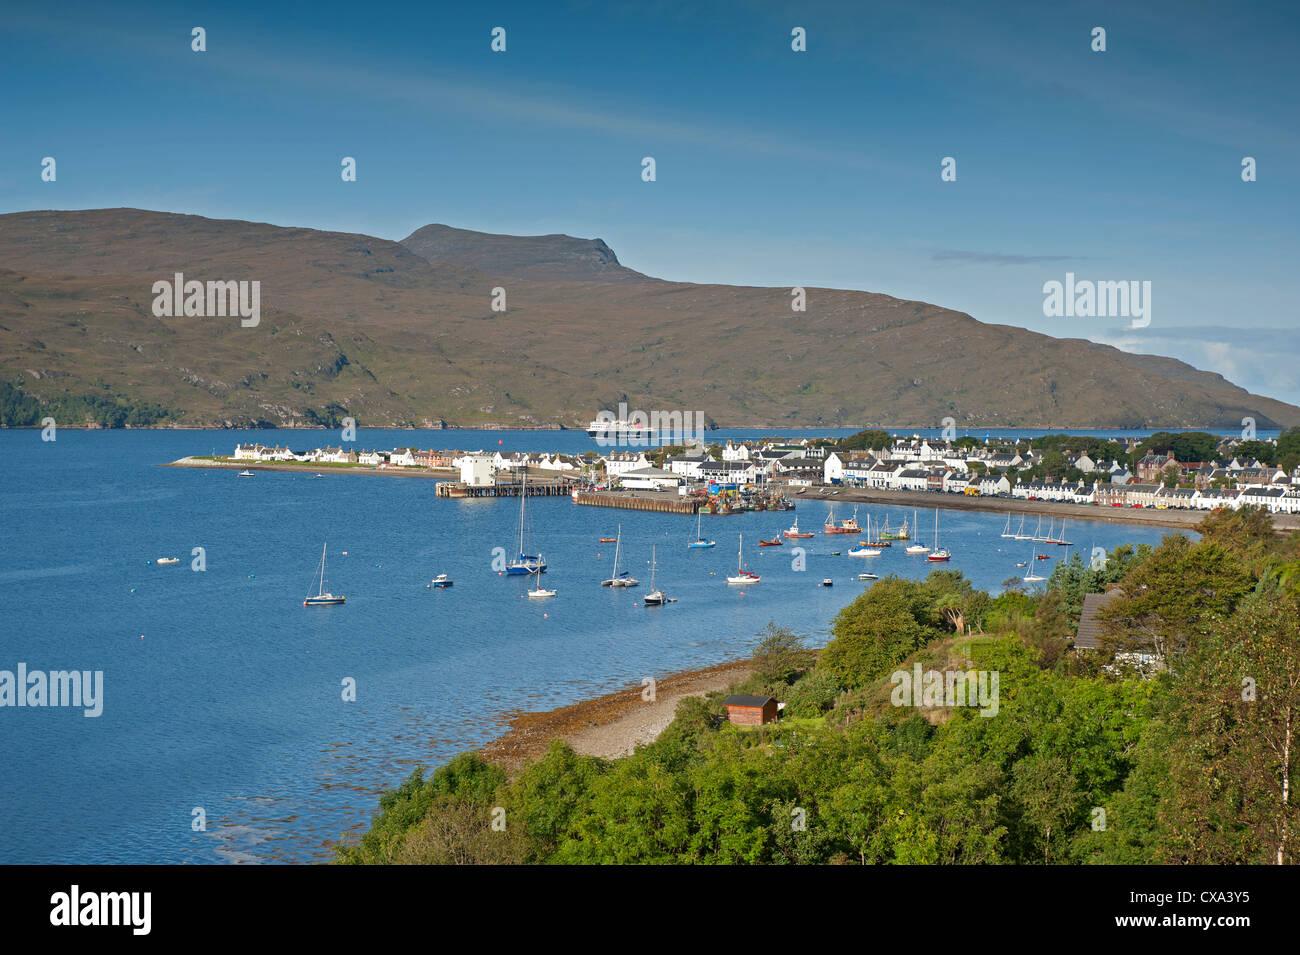 Ullapool, fishing and tourist ferry port on Loch Broom, Wester Ross Highland Region Scotland.  SCO 8528 Stock Photo